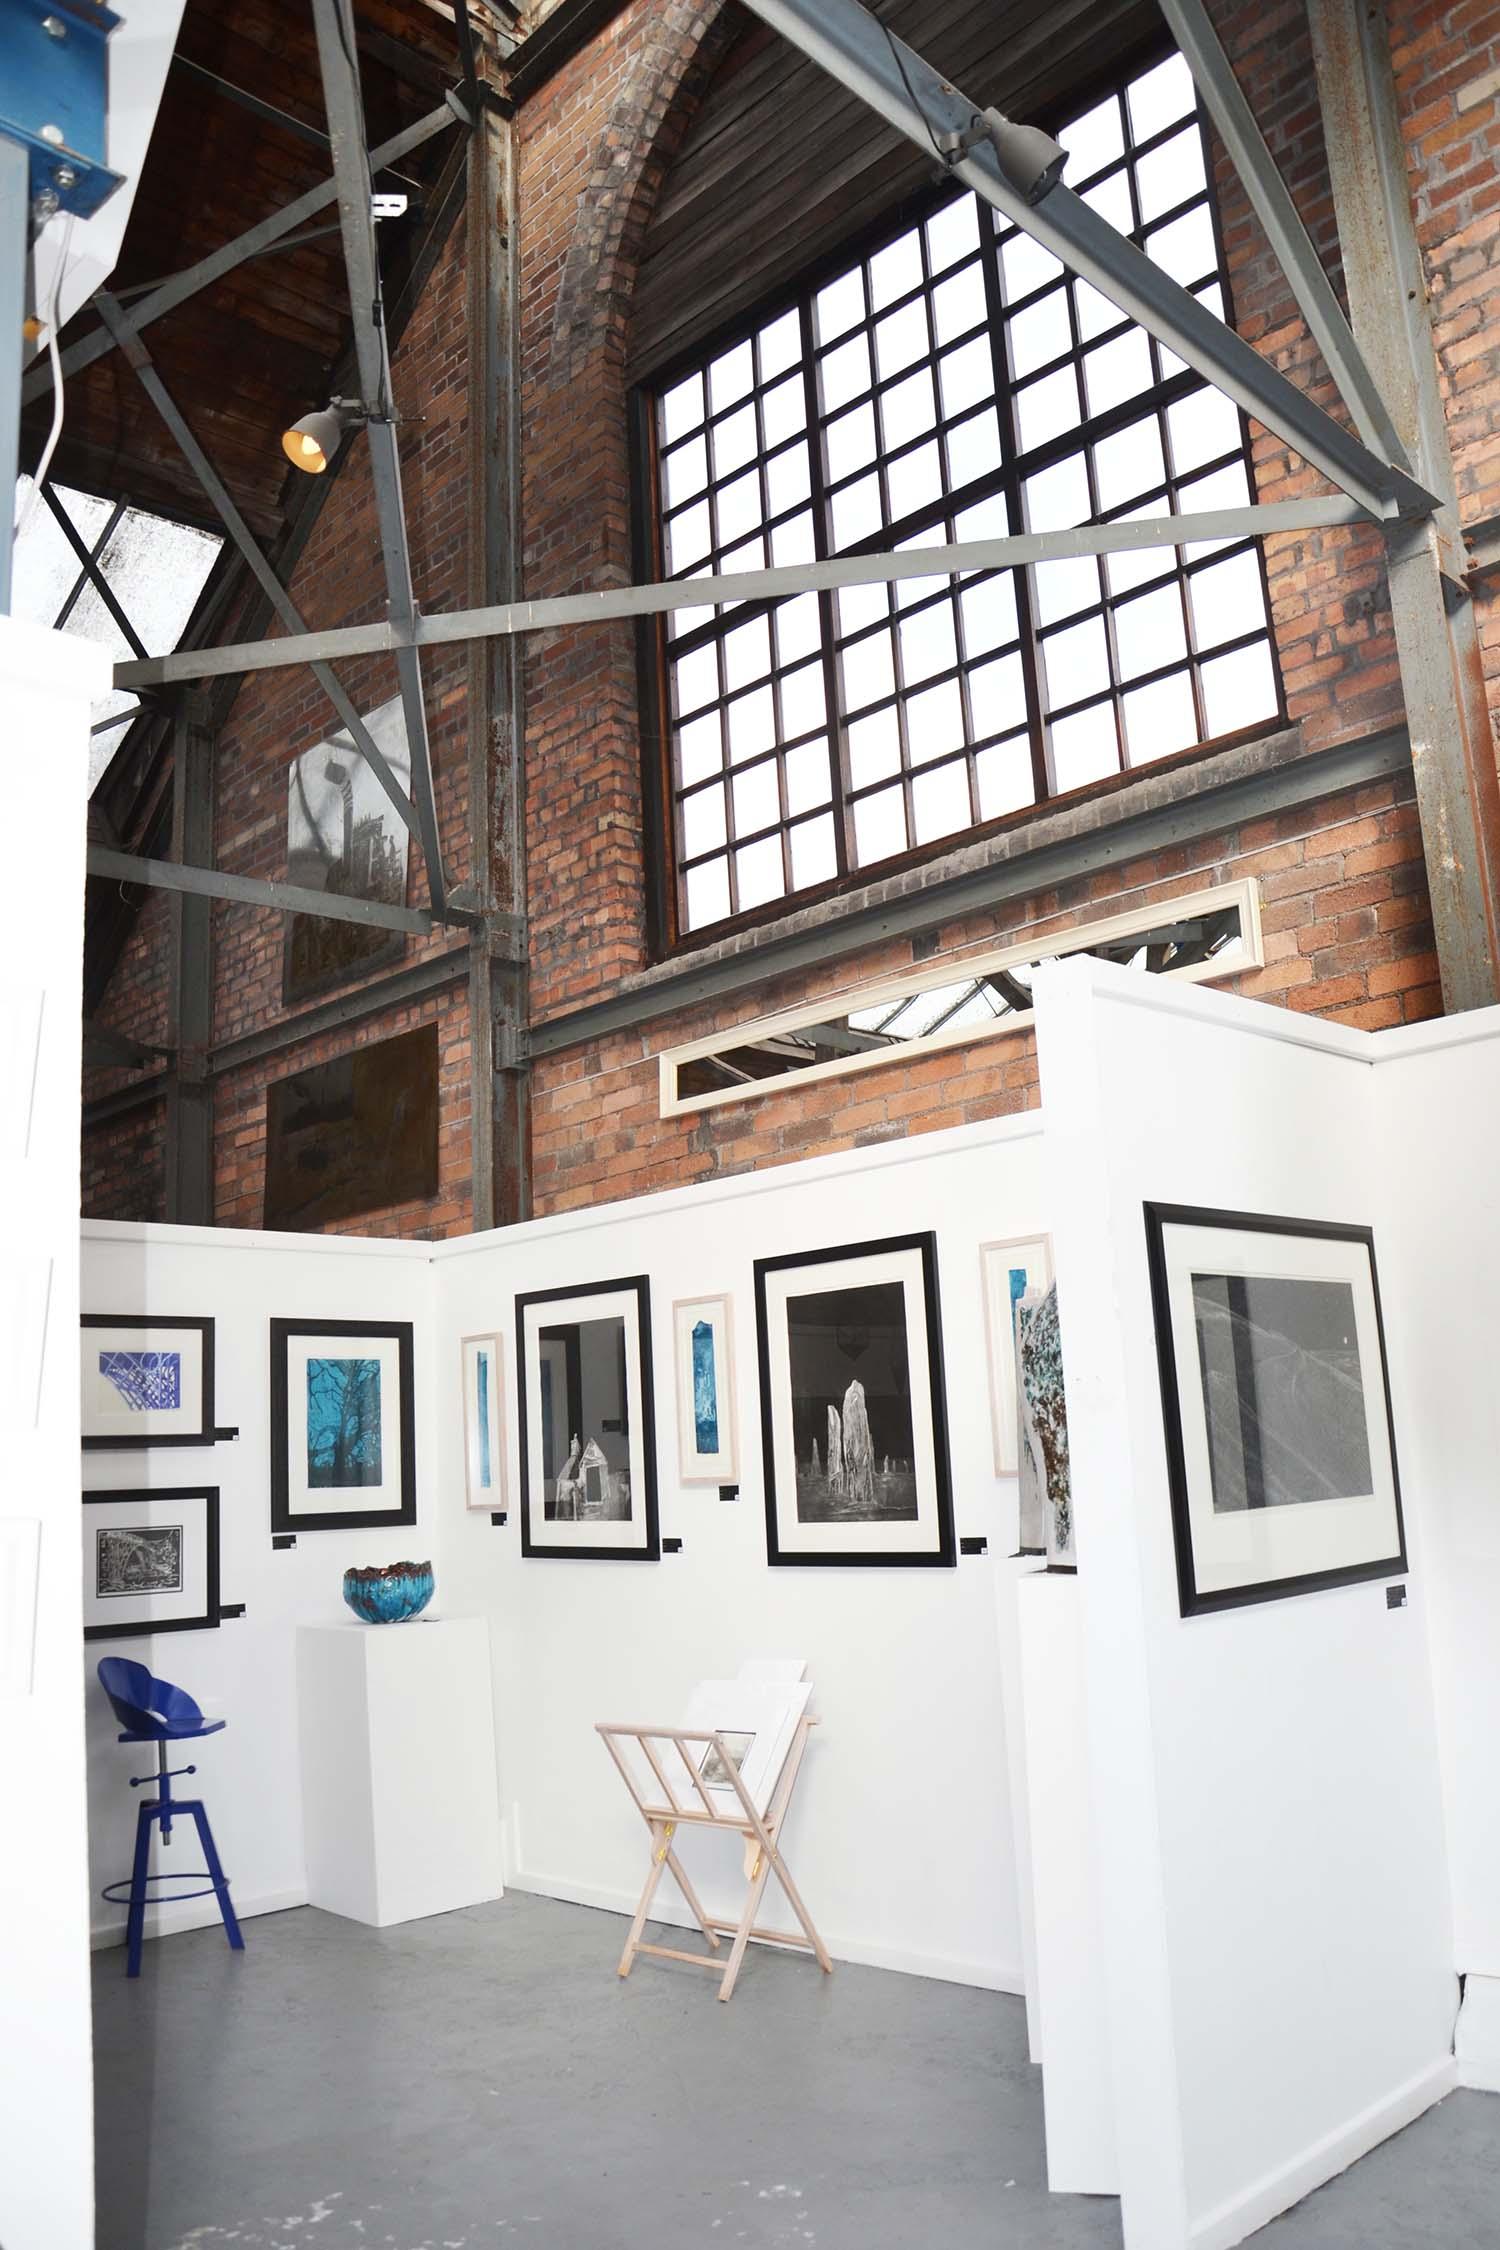 Exhibition-Image-5